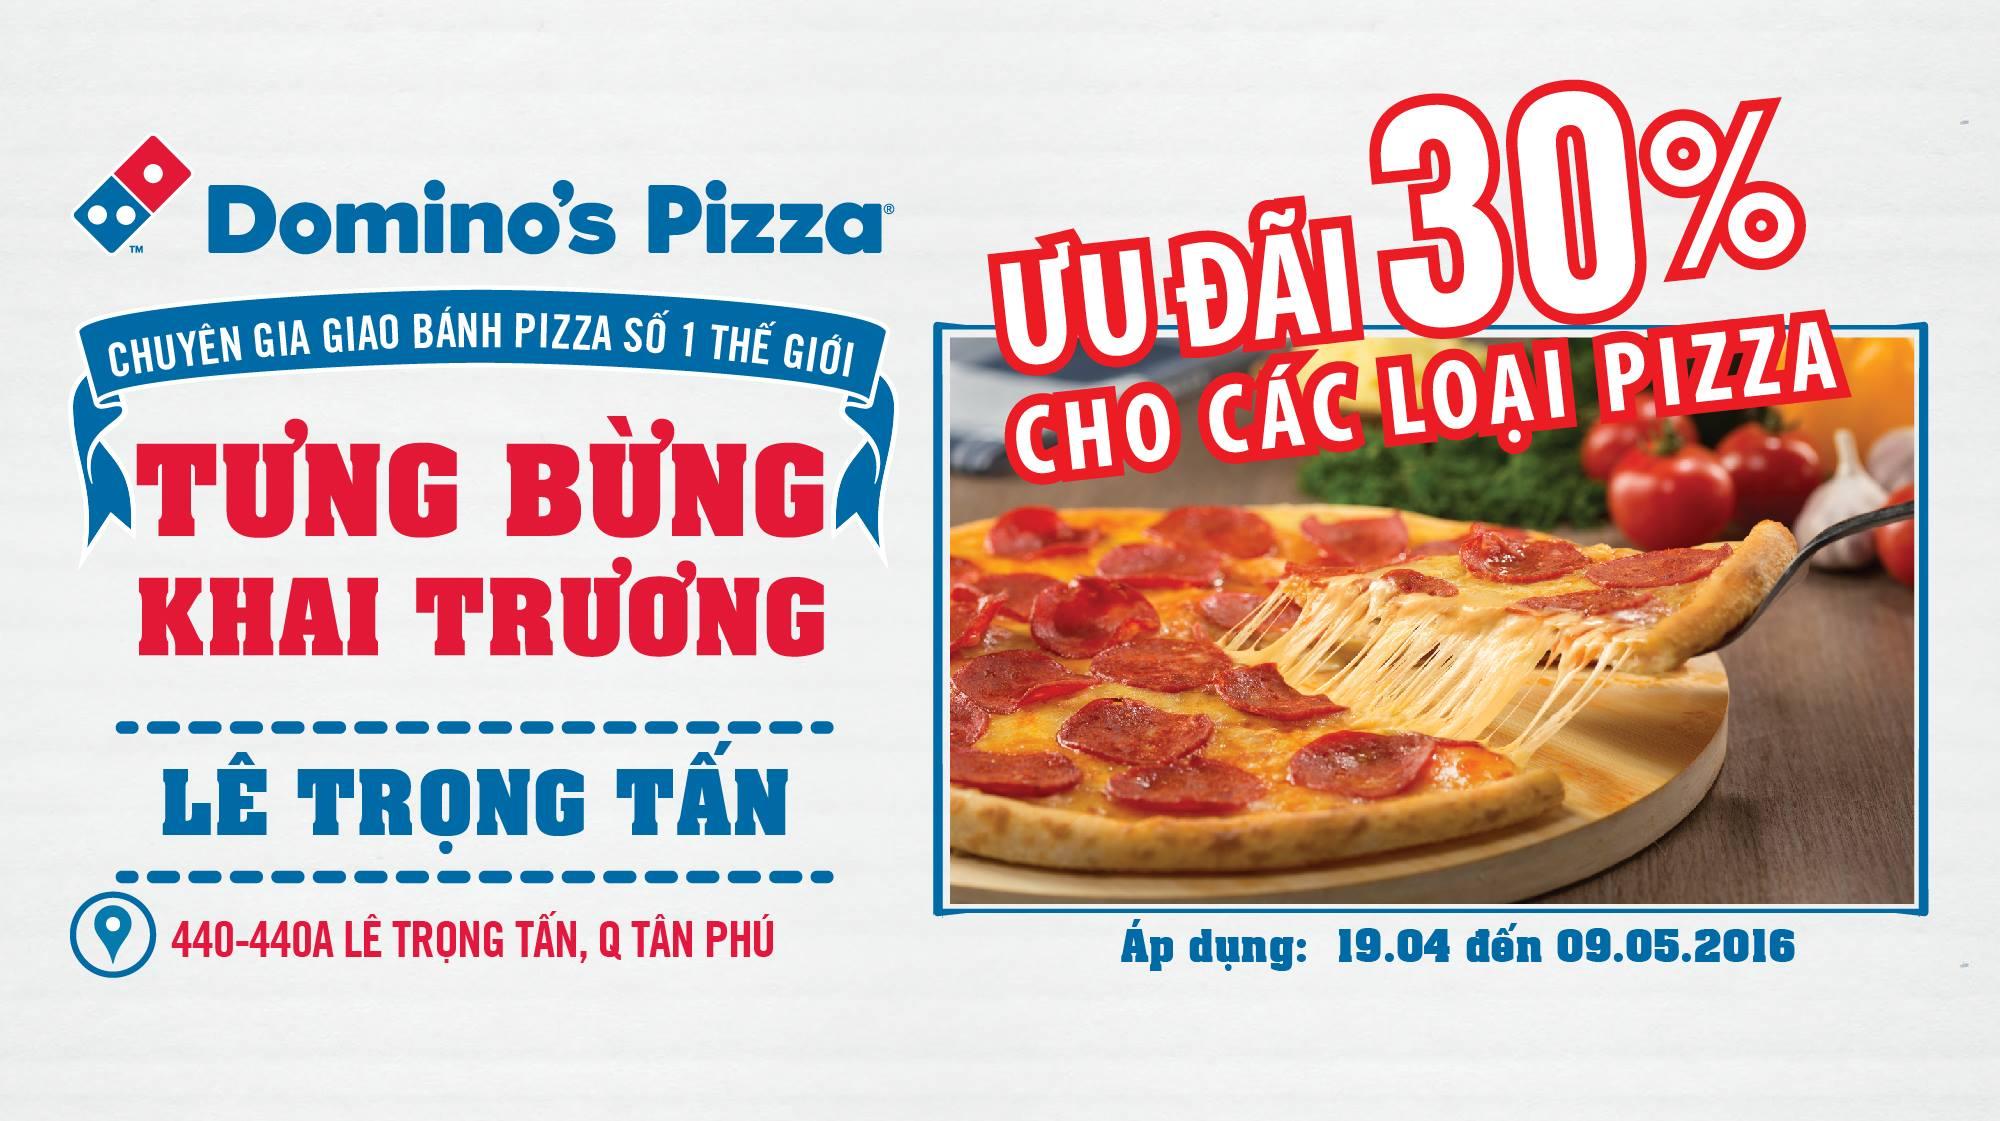 dominos-pizza-le-trong-tan-khuyen-mai-khai-truong-giam-gia-30-pizza